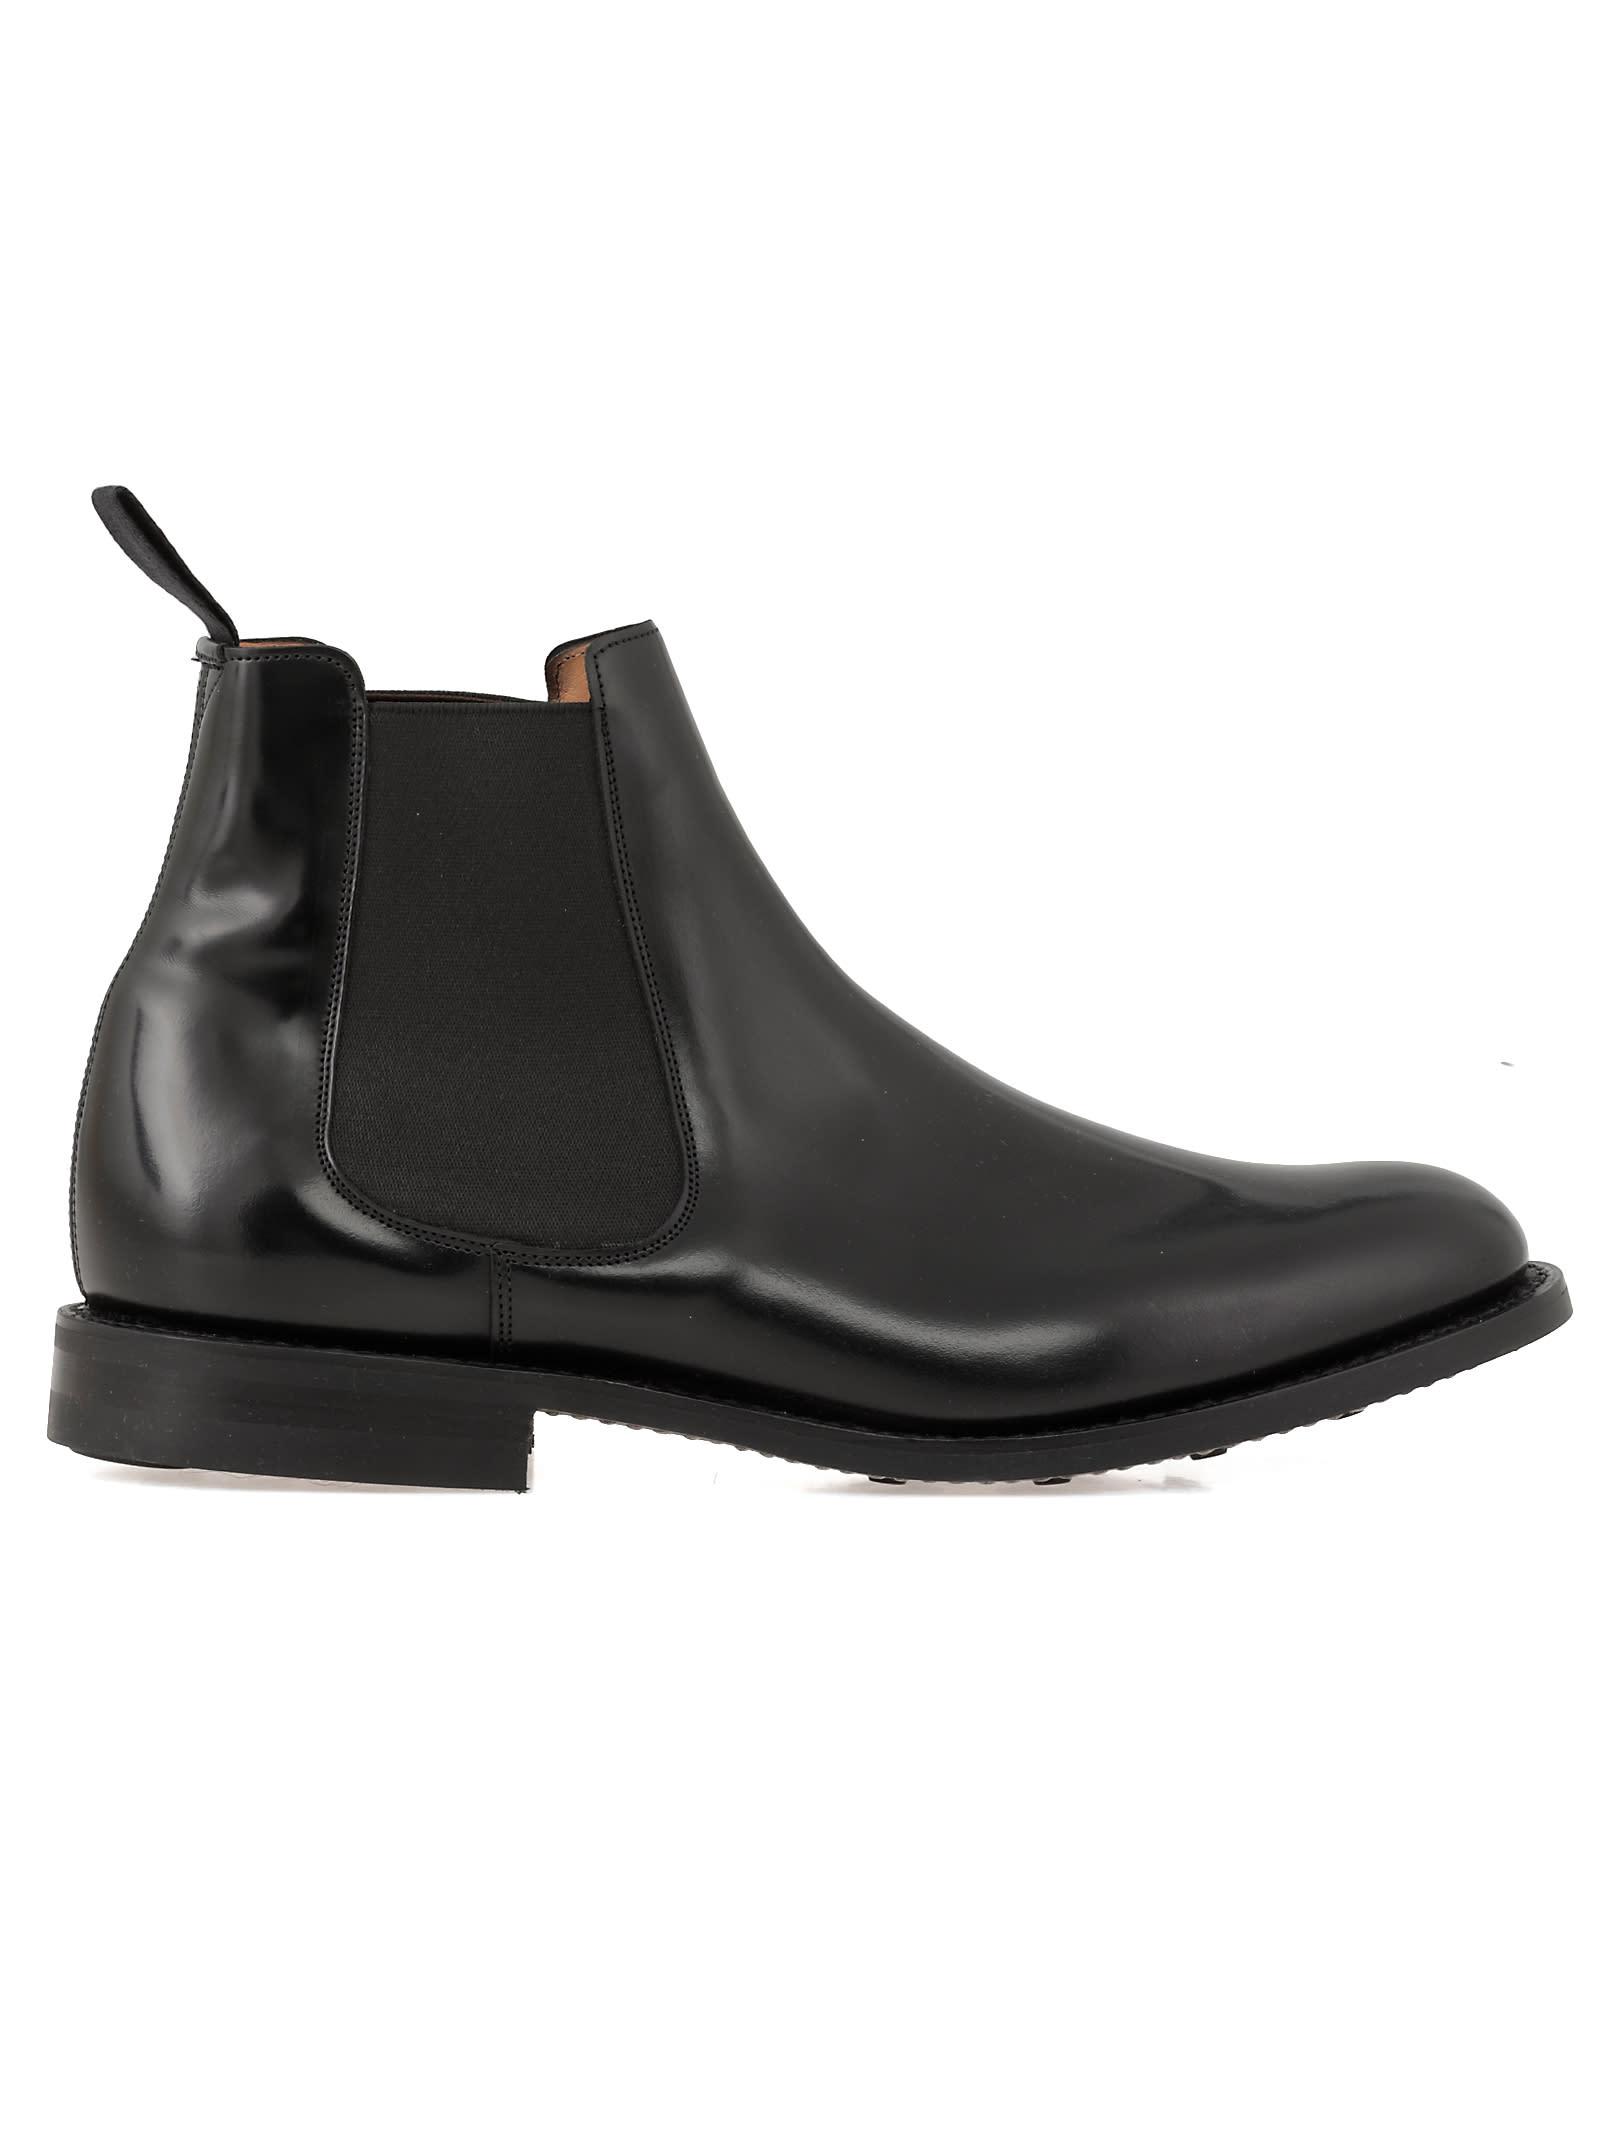 Churchs Leather Chelsea Boot